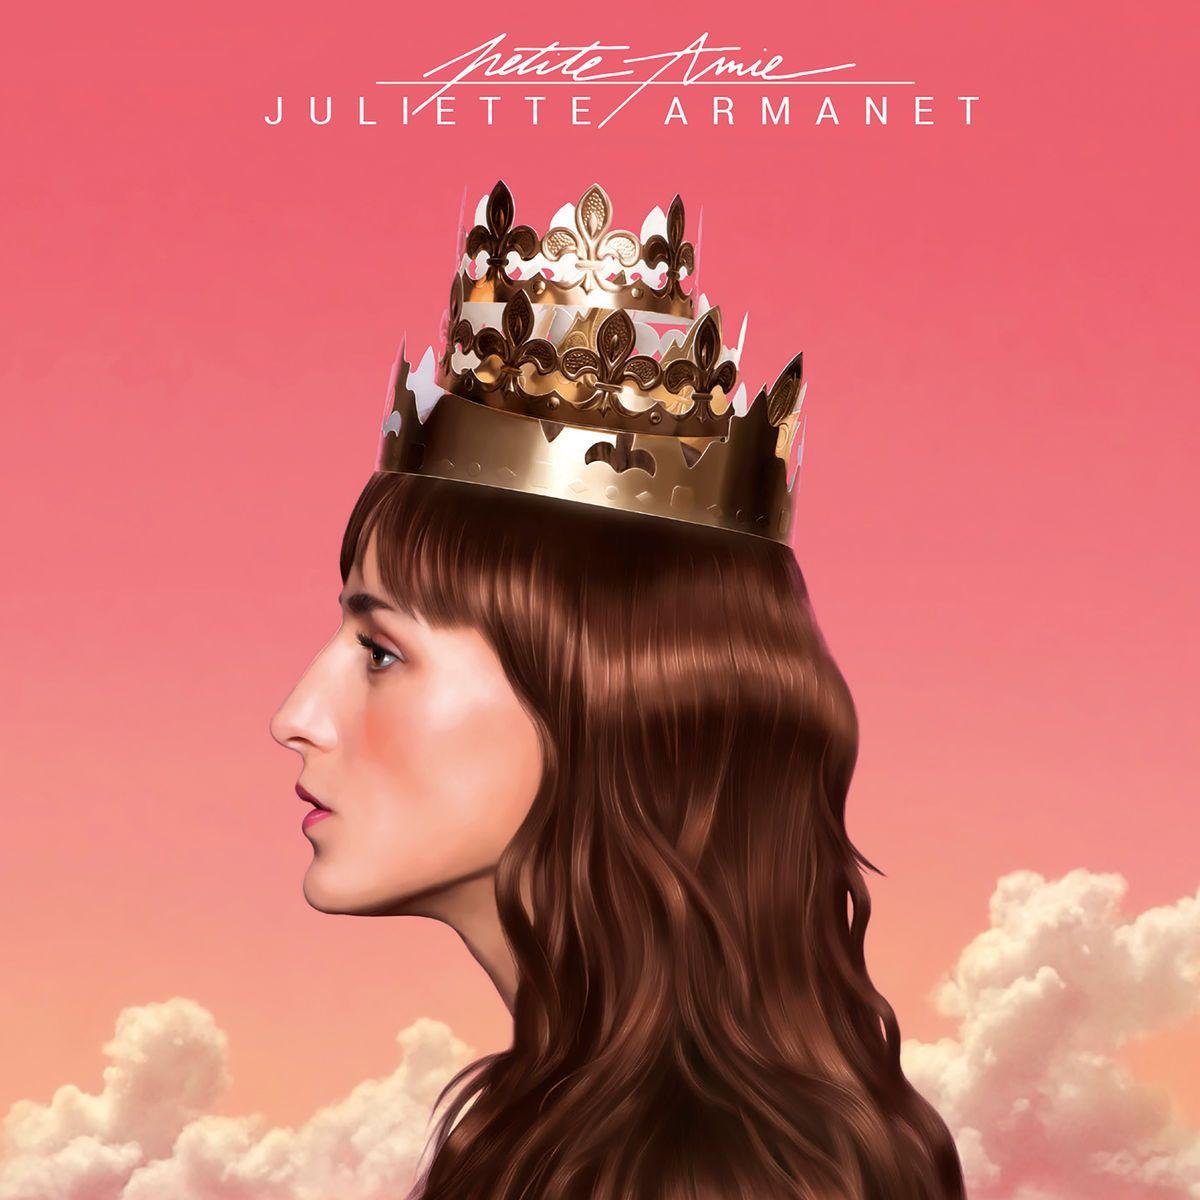 Juliette Armanet - Petite Amie album cover